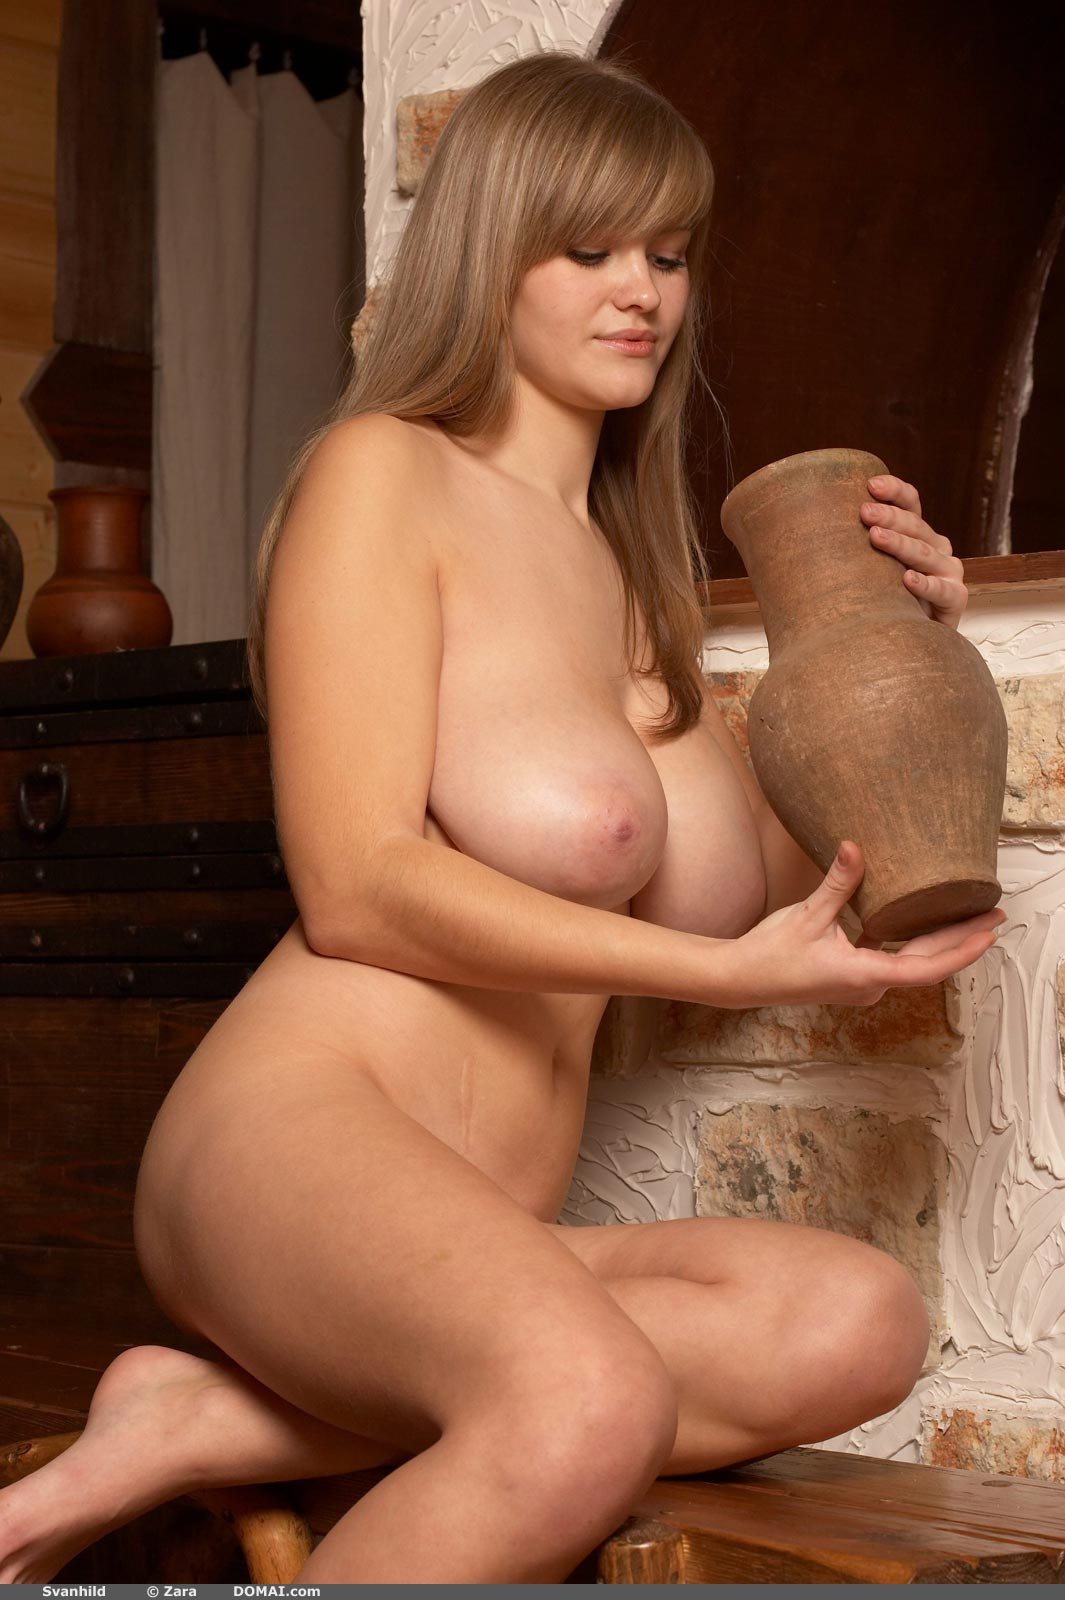 Nude petite women svanhild